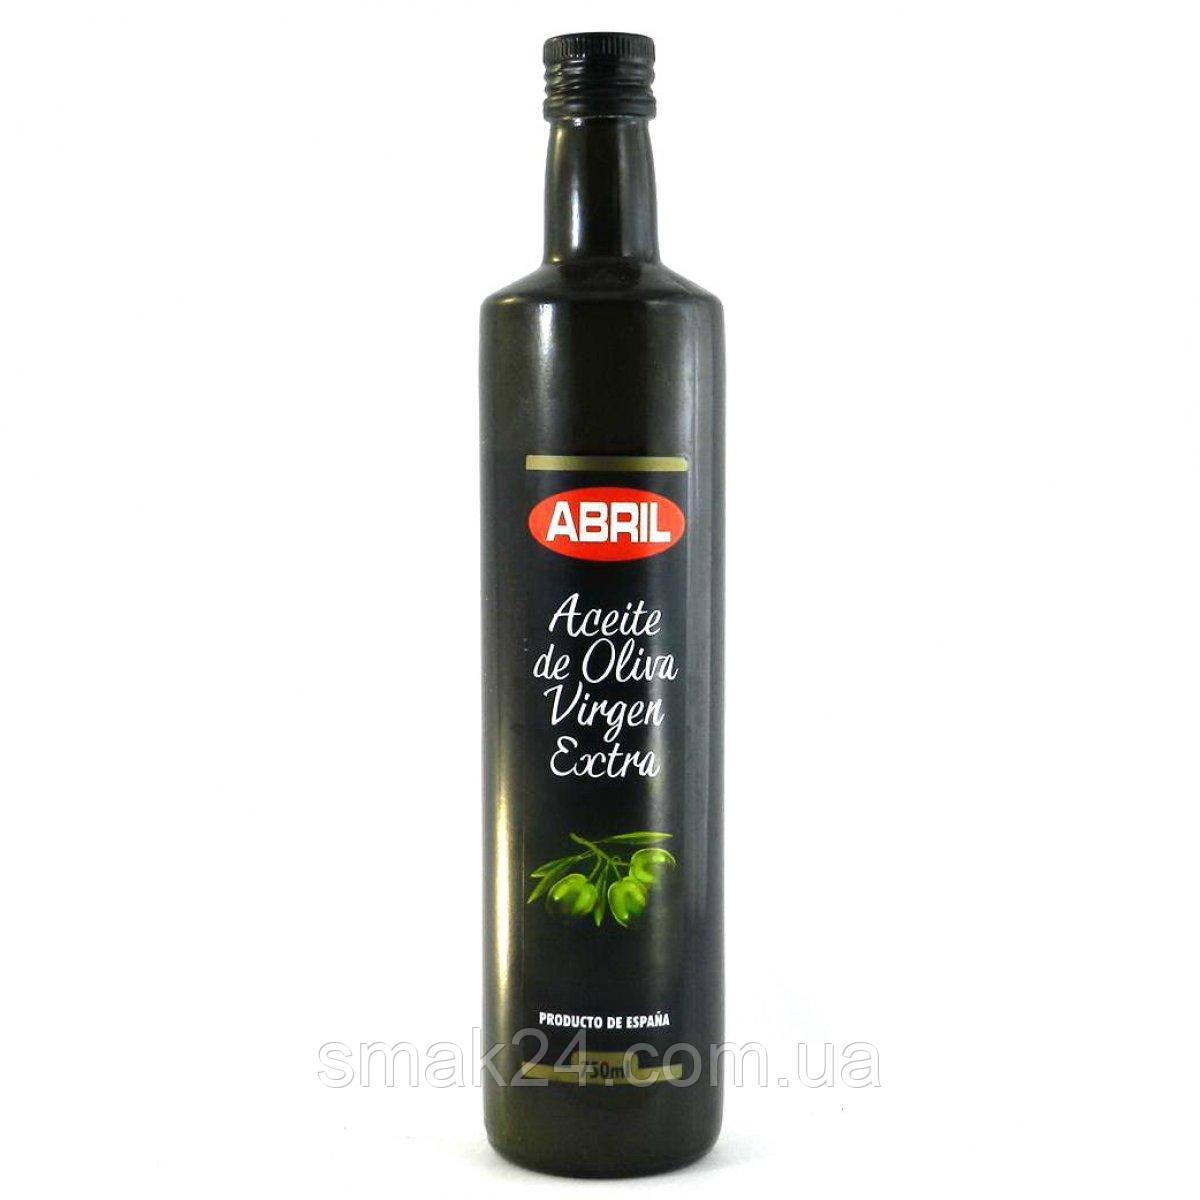 Масло оливковое  Abril Aceite de oliva virgen extra  750 мл Испания